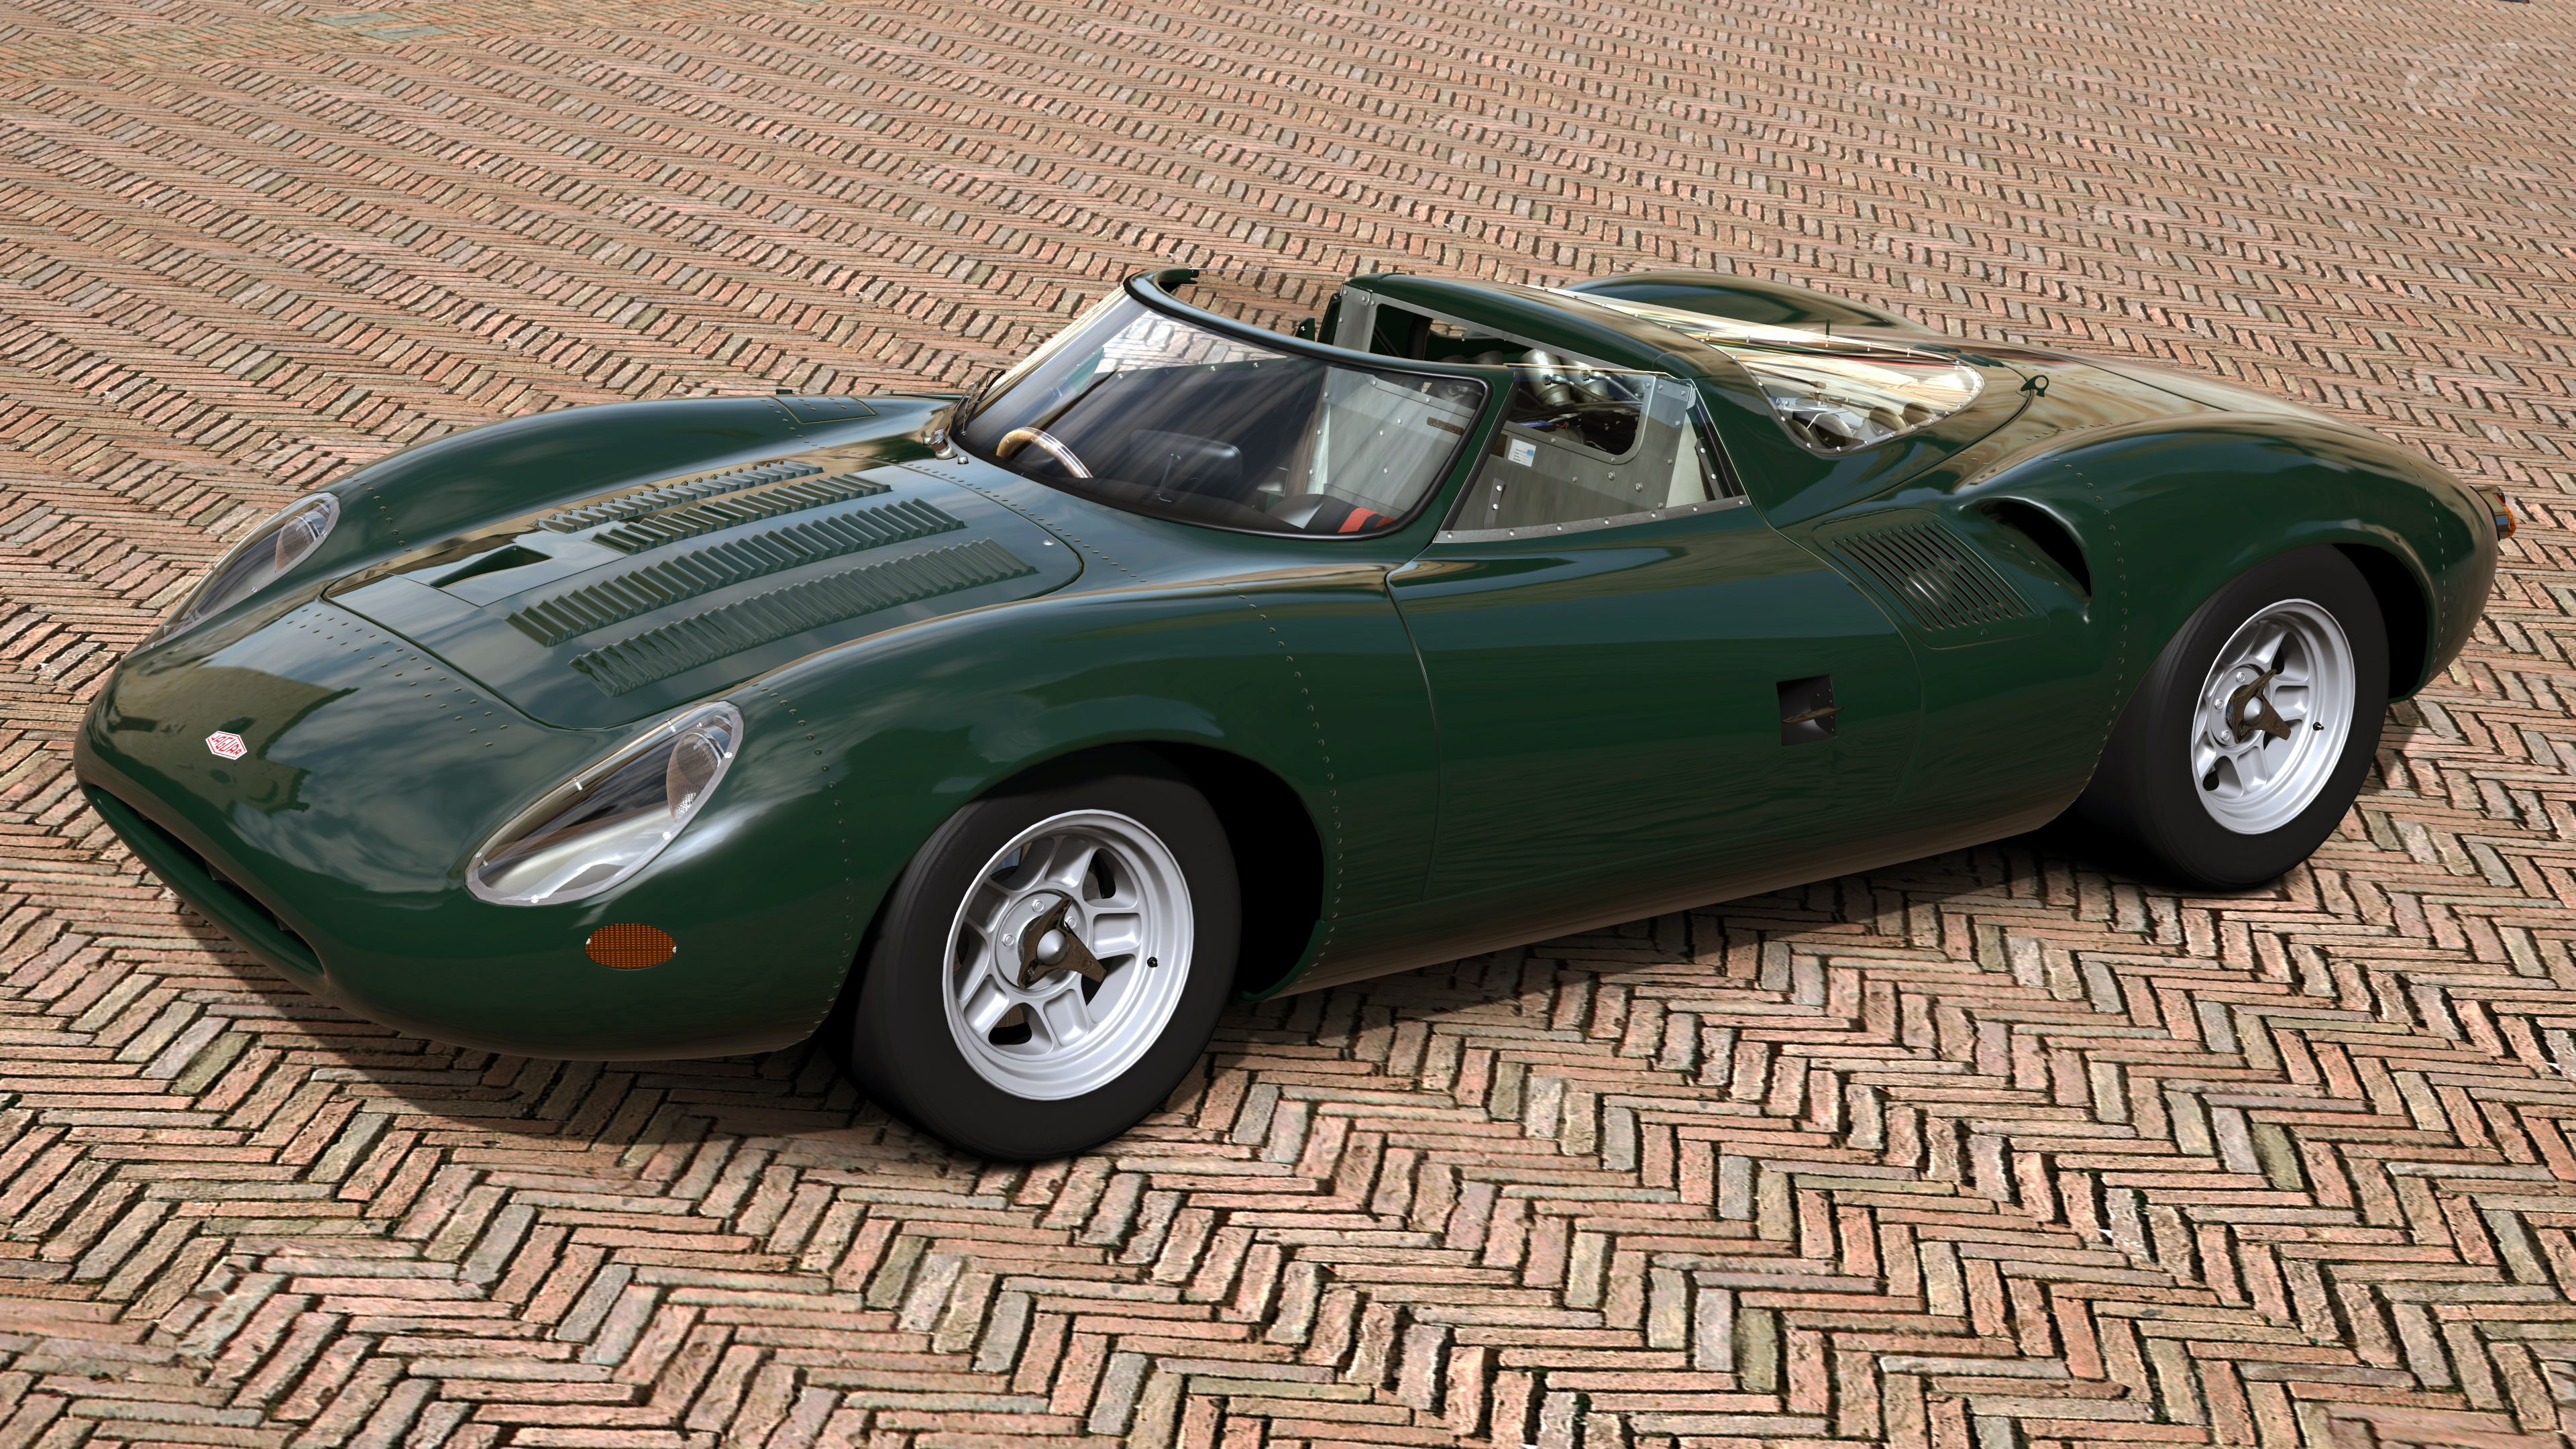 sale near at jaguar cars cmc sussex xk brighton watch for auto